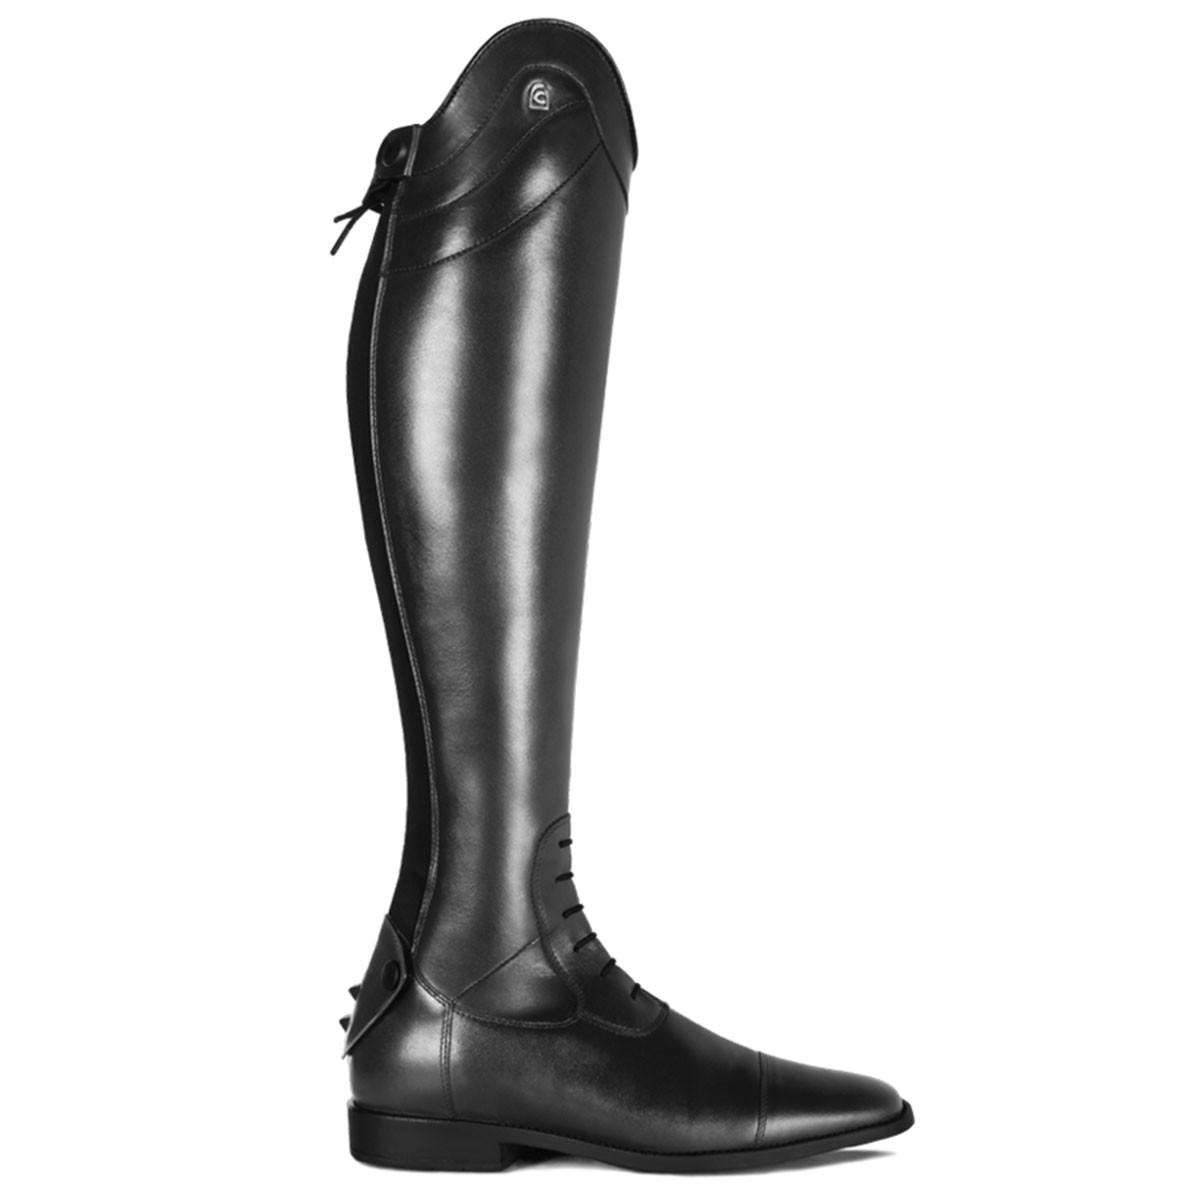 Cavallo Linus Slim rijlaars zwart maat:9-9.5 / h51-w37